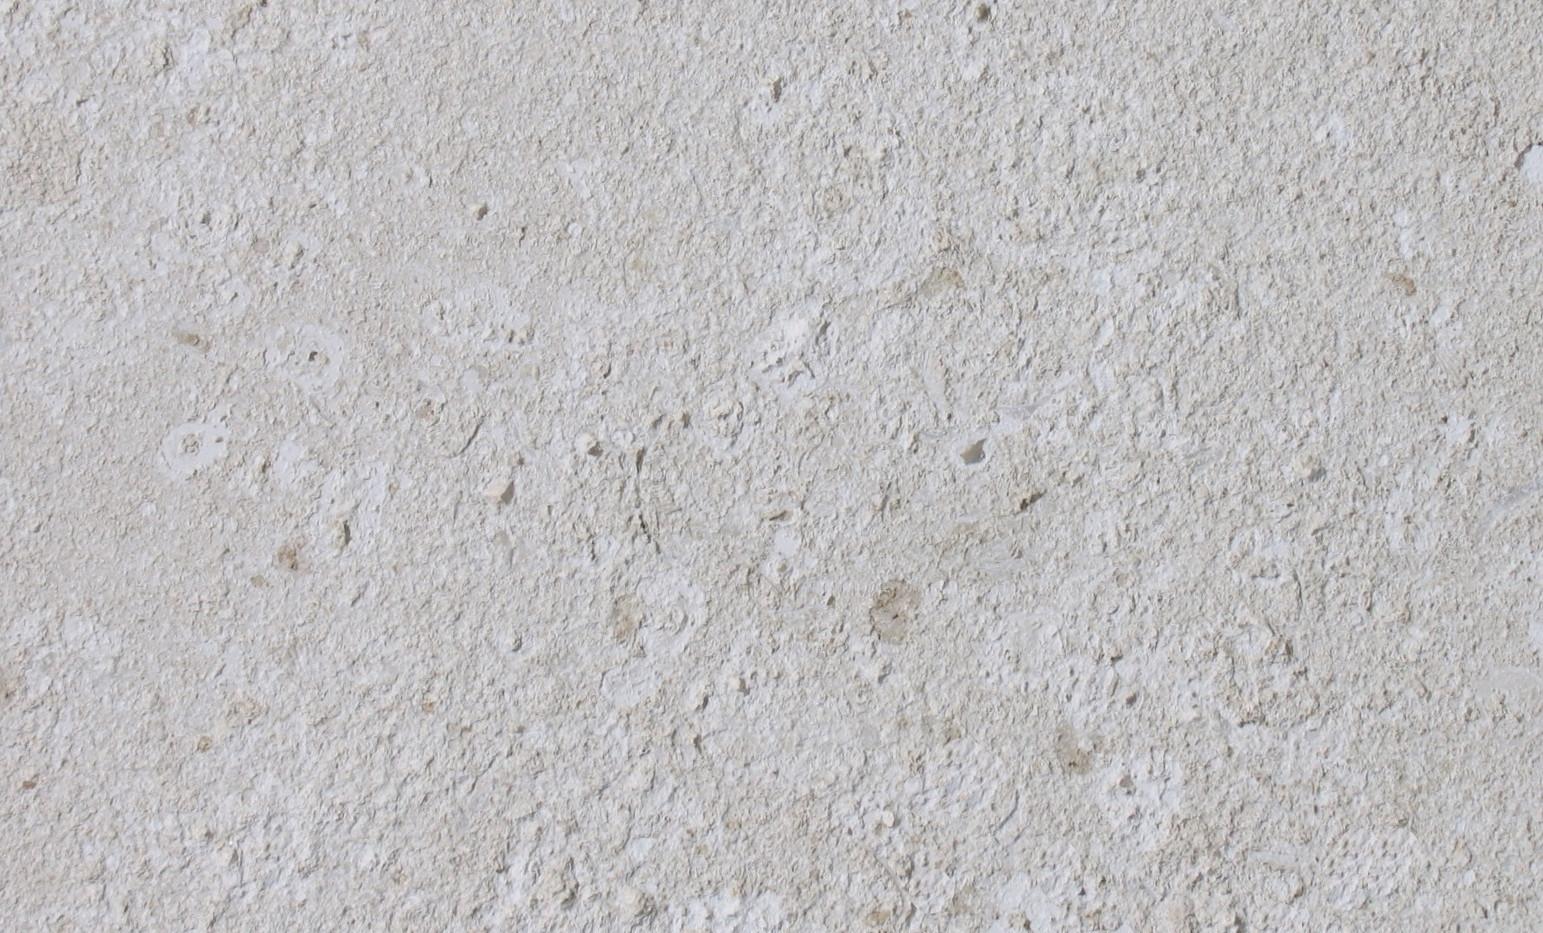 04-bianco-avorio-sabbiato.jpg